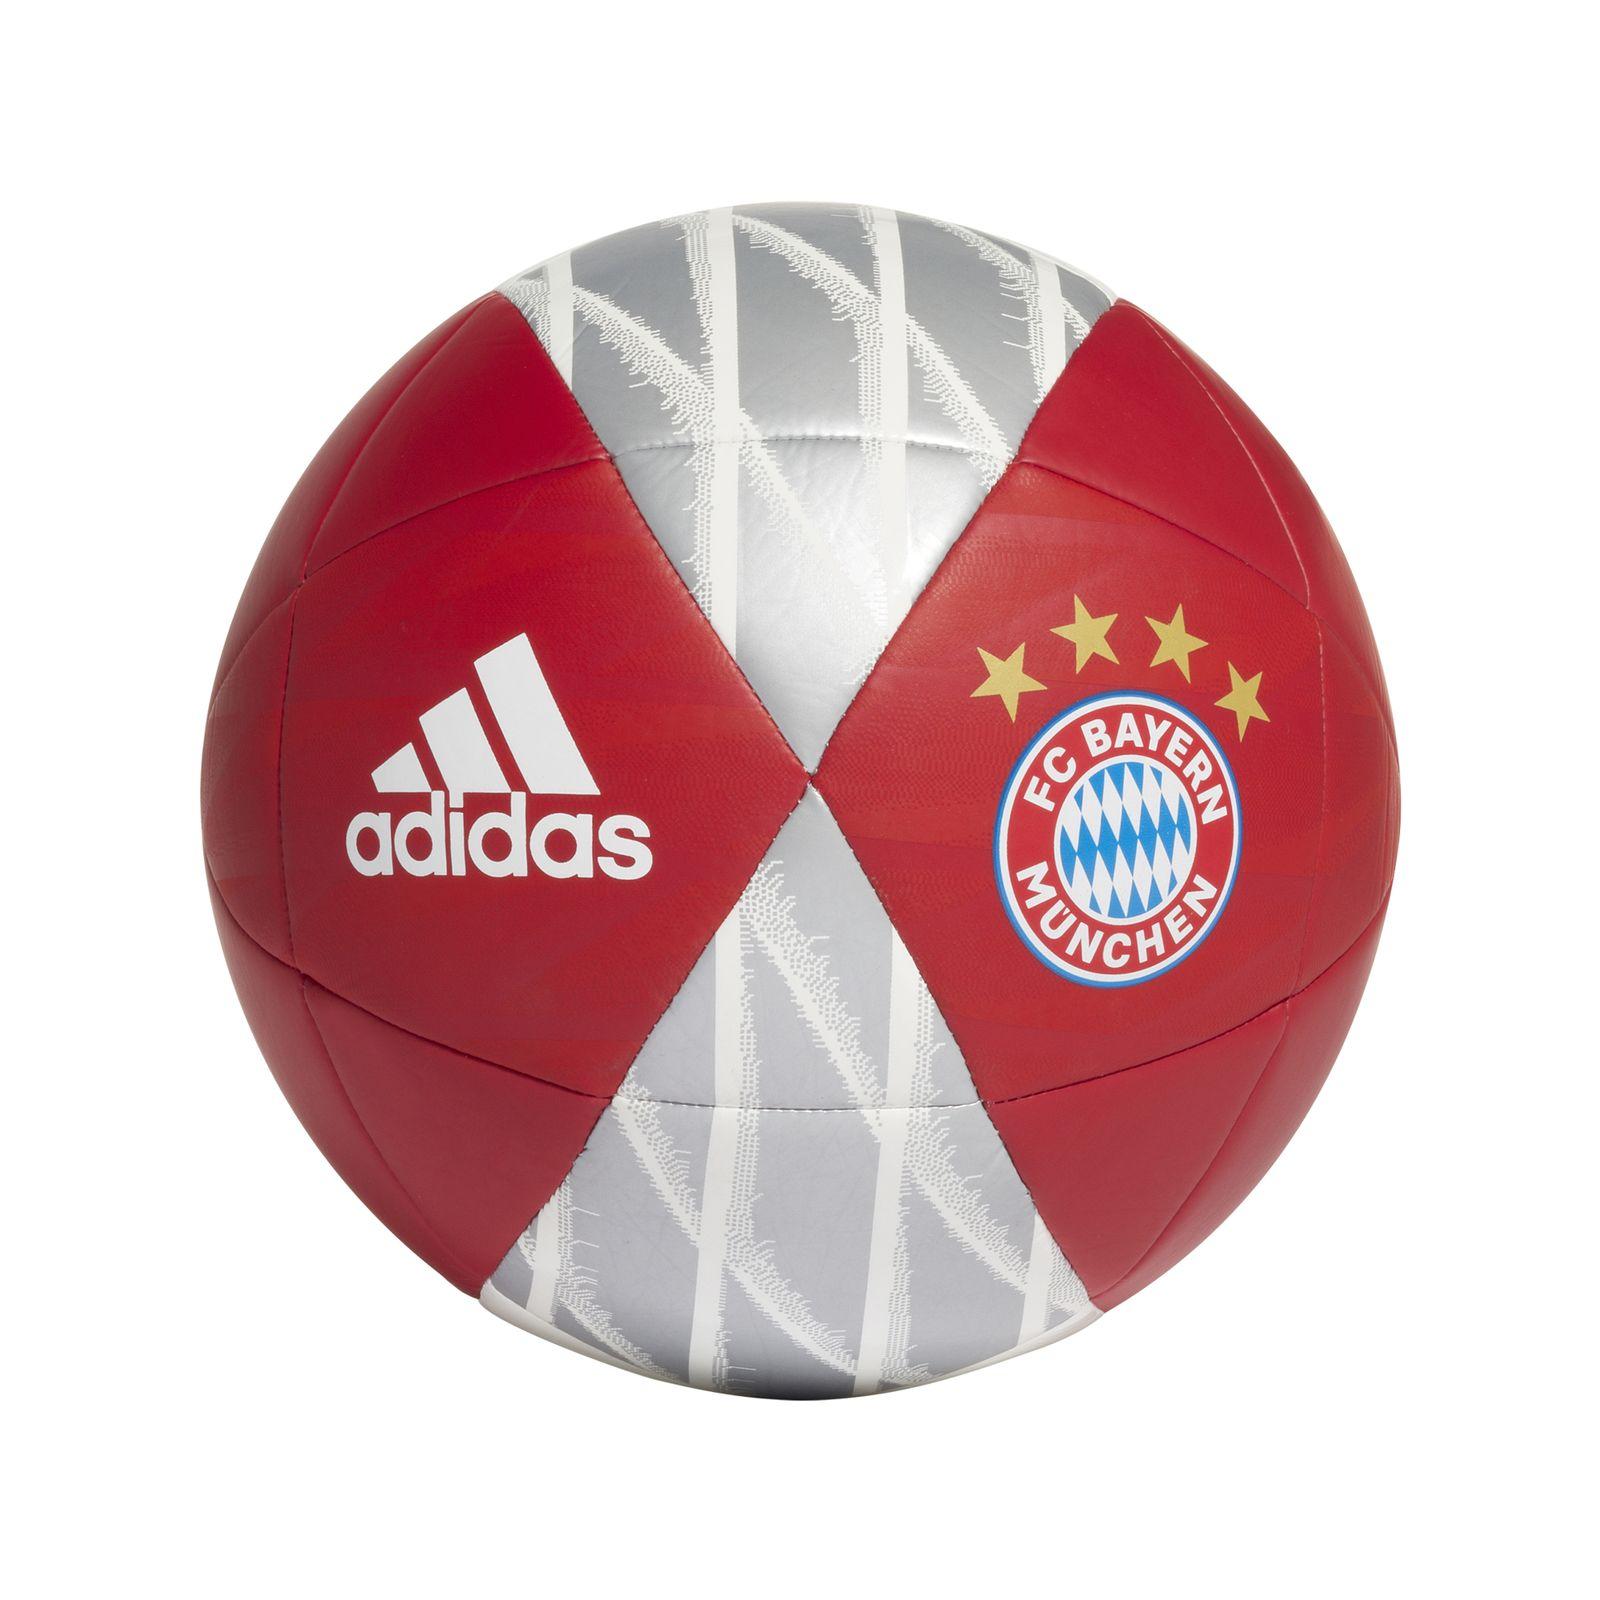 adidas Fussball Bayern München FCB FC BAYERN Capitano rot-weiß